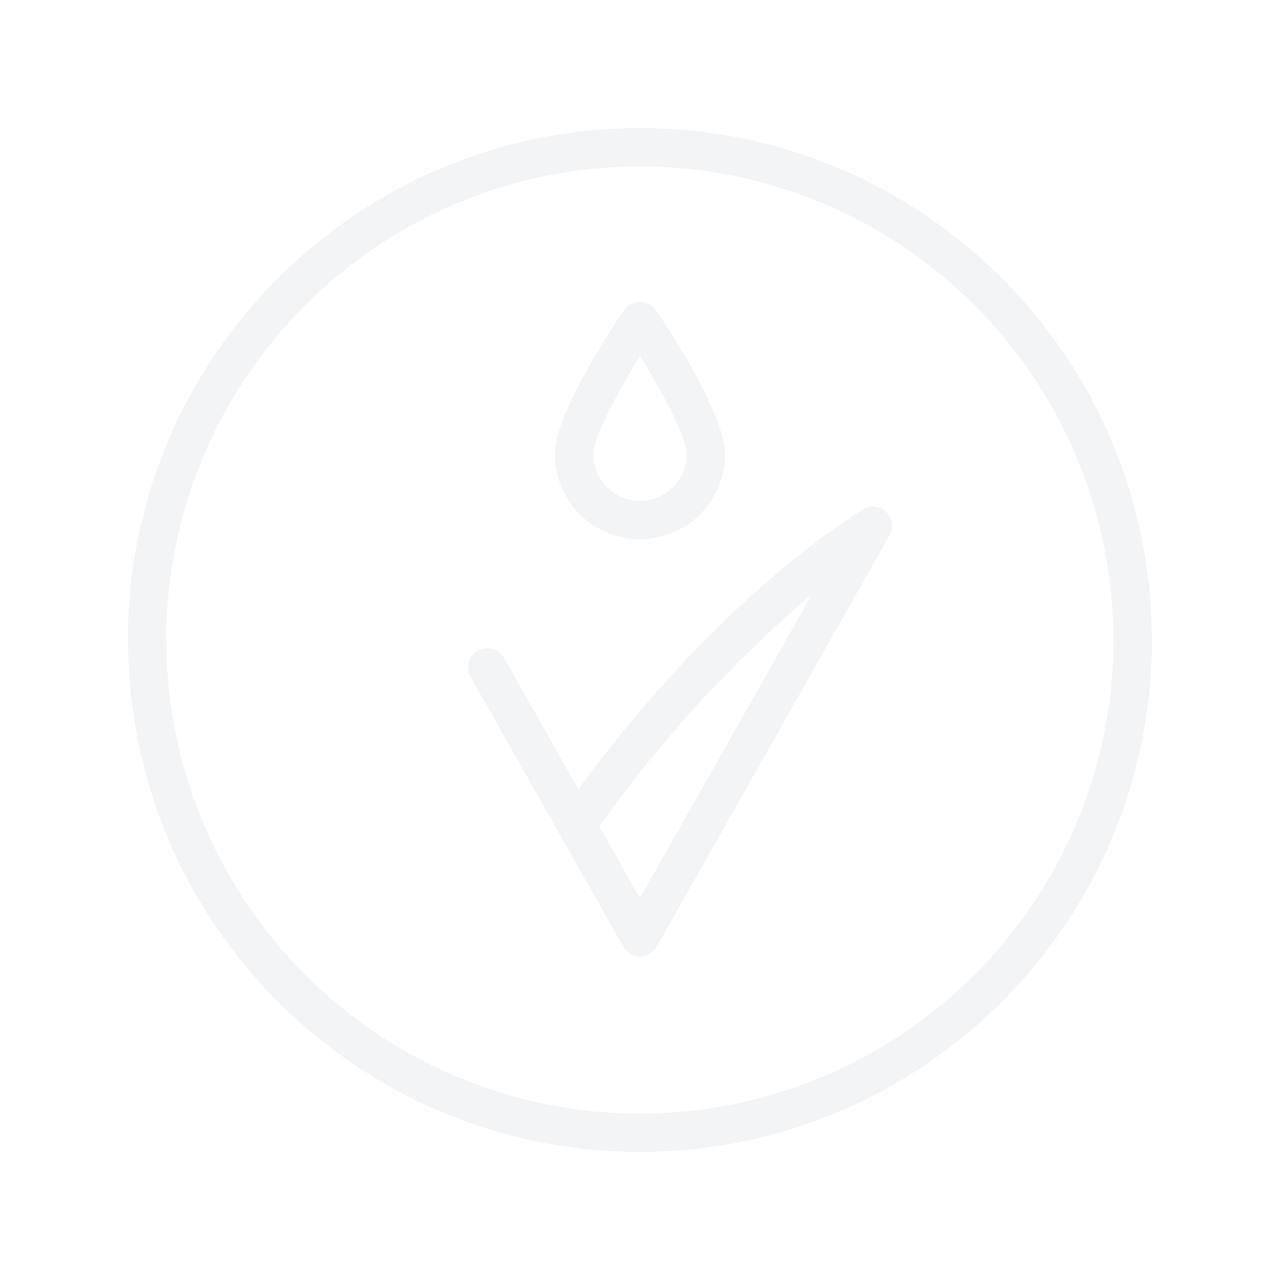 Dr. Hauschka Hydrating Foot Cream 75ml